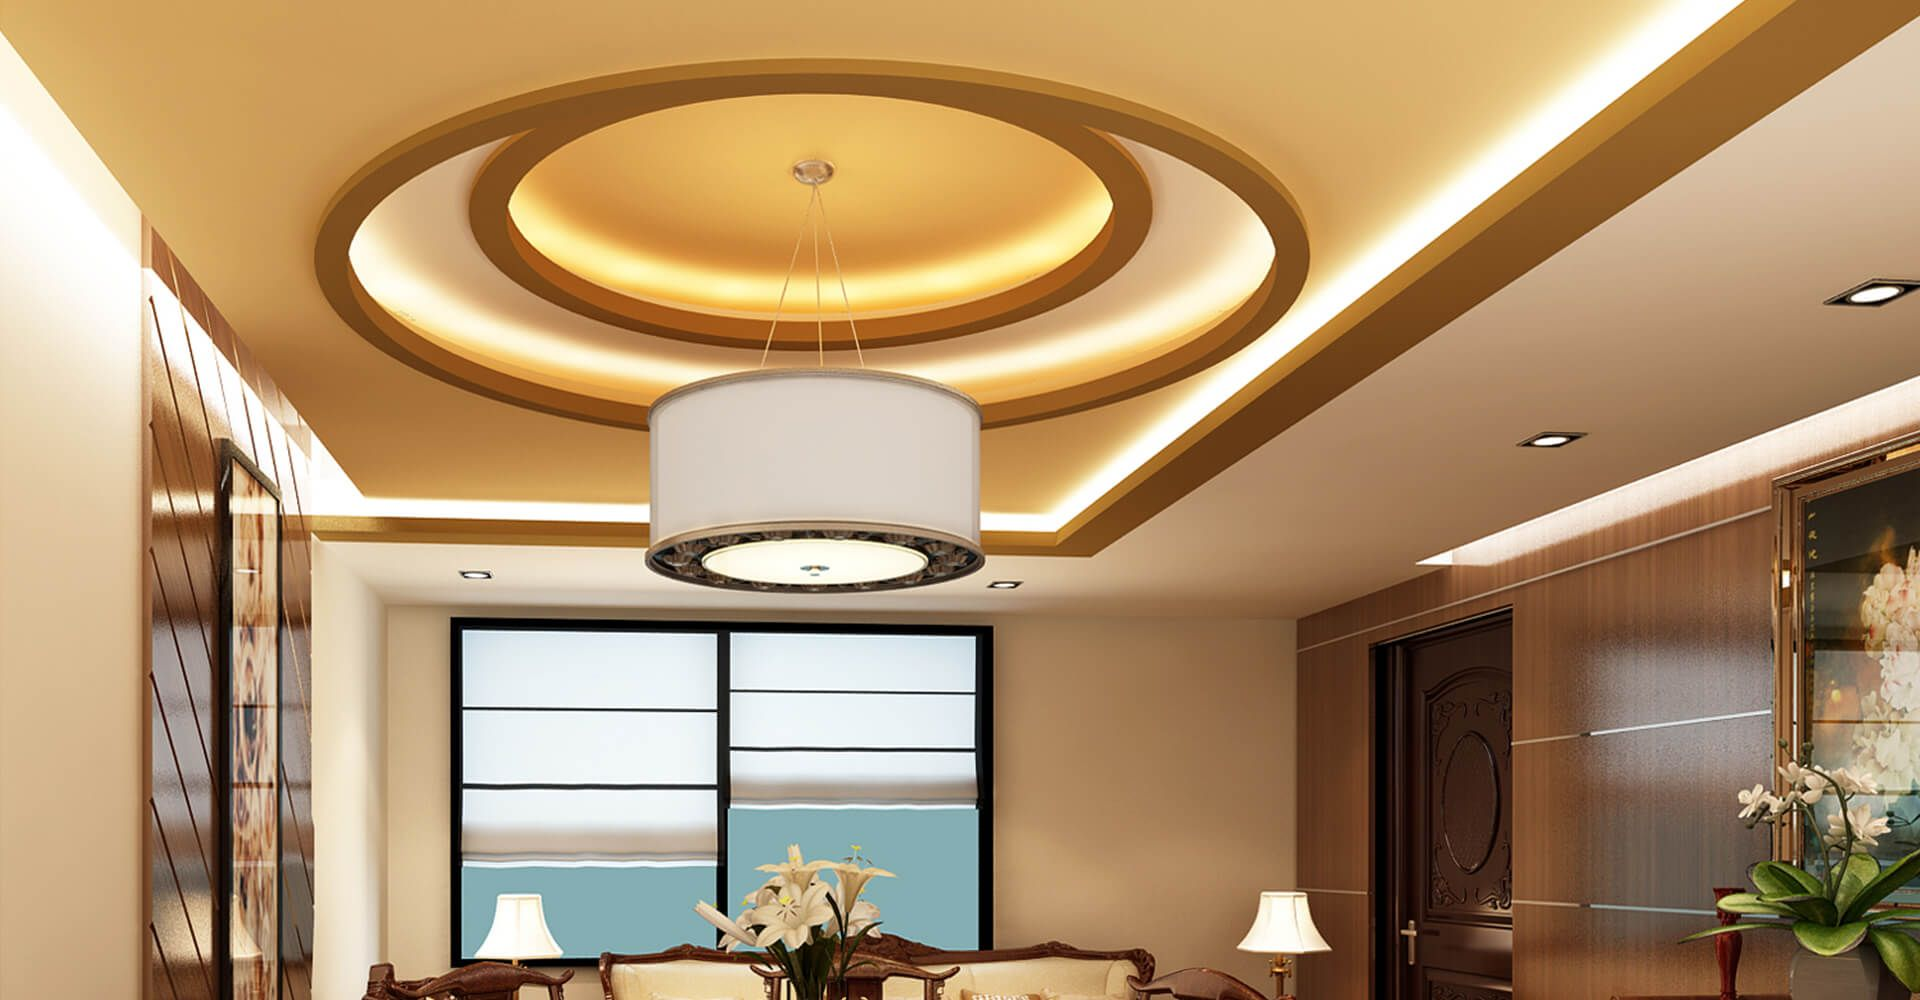 residential false ceiling   False Ceiling   Gypsum Board ...